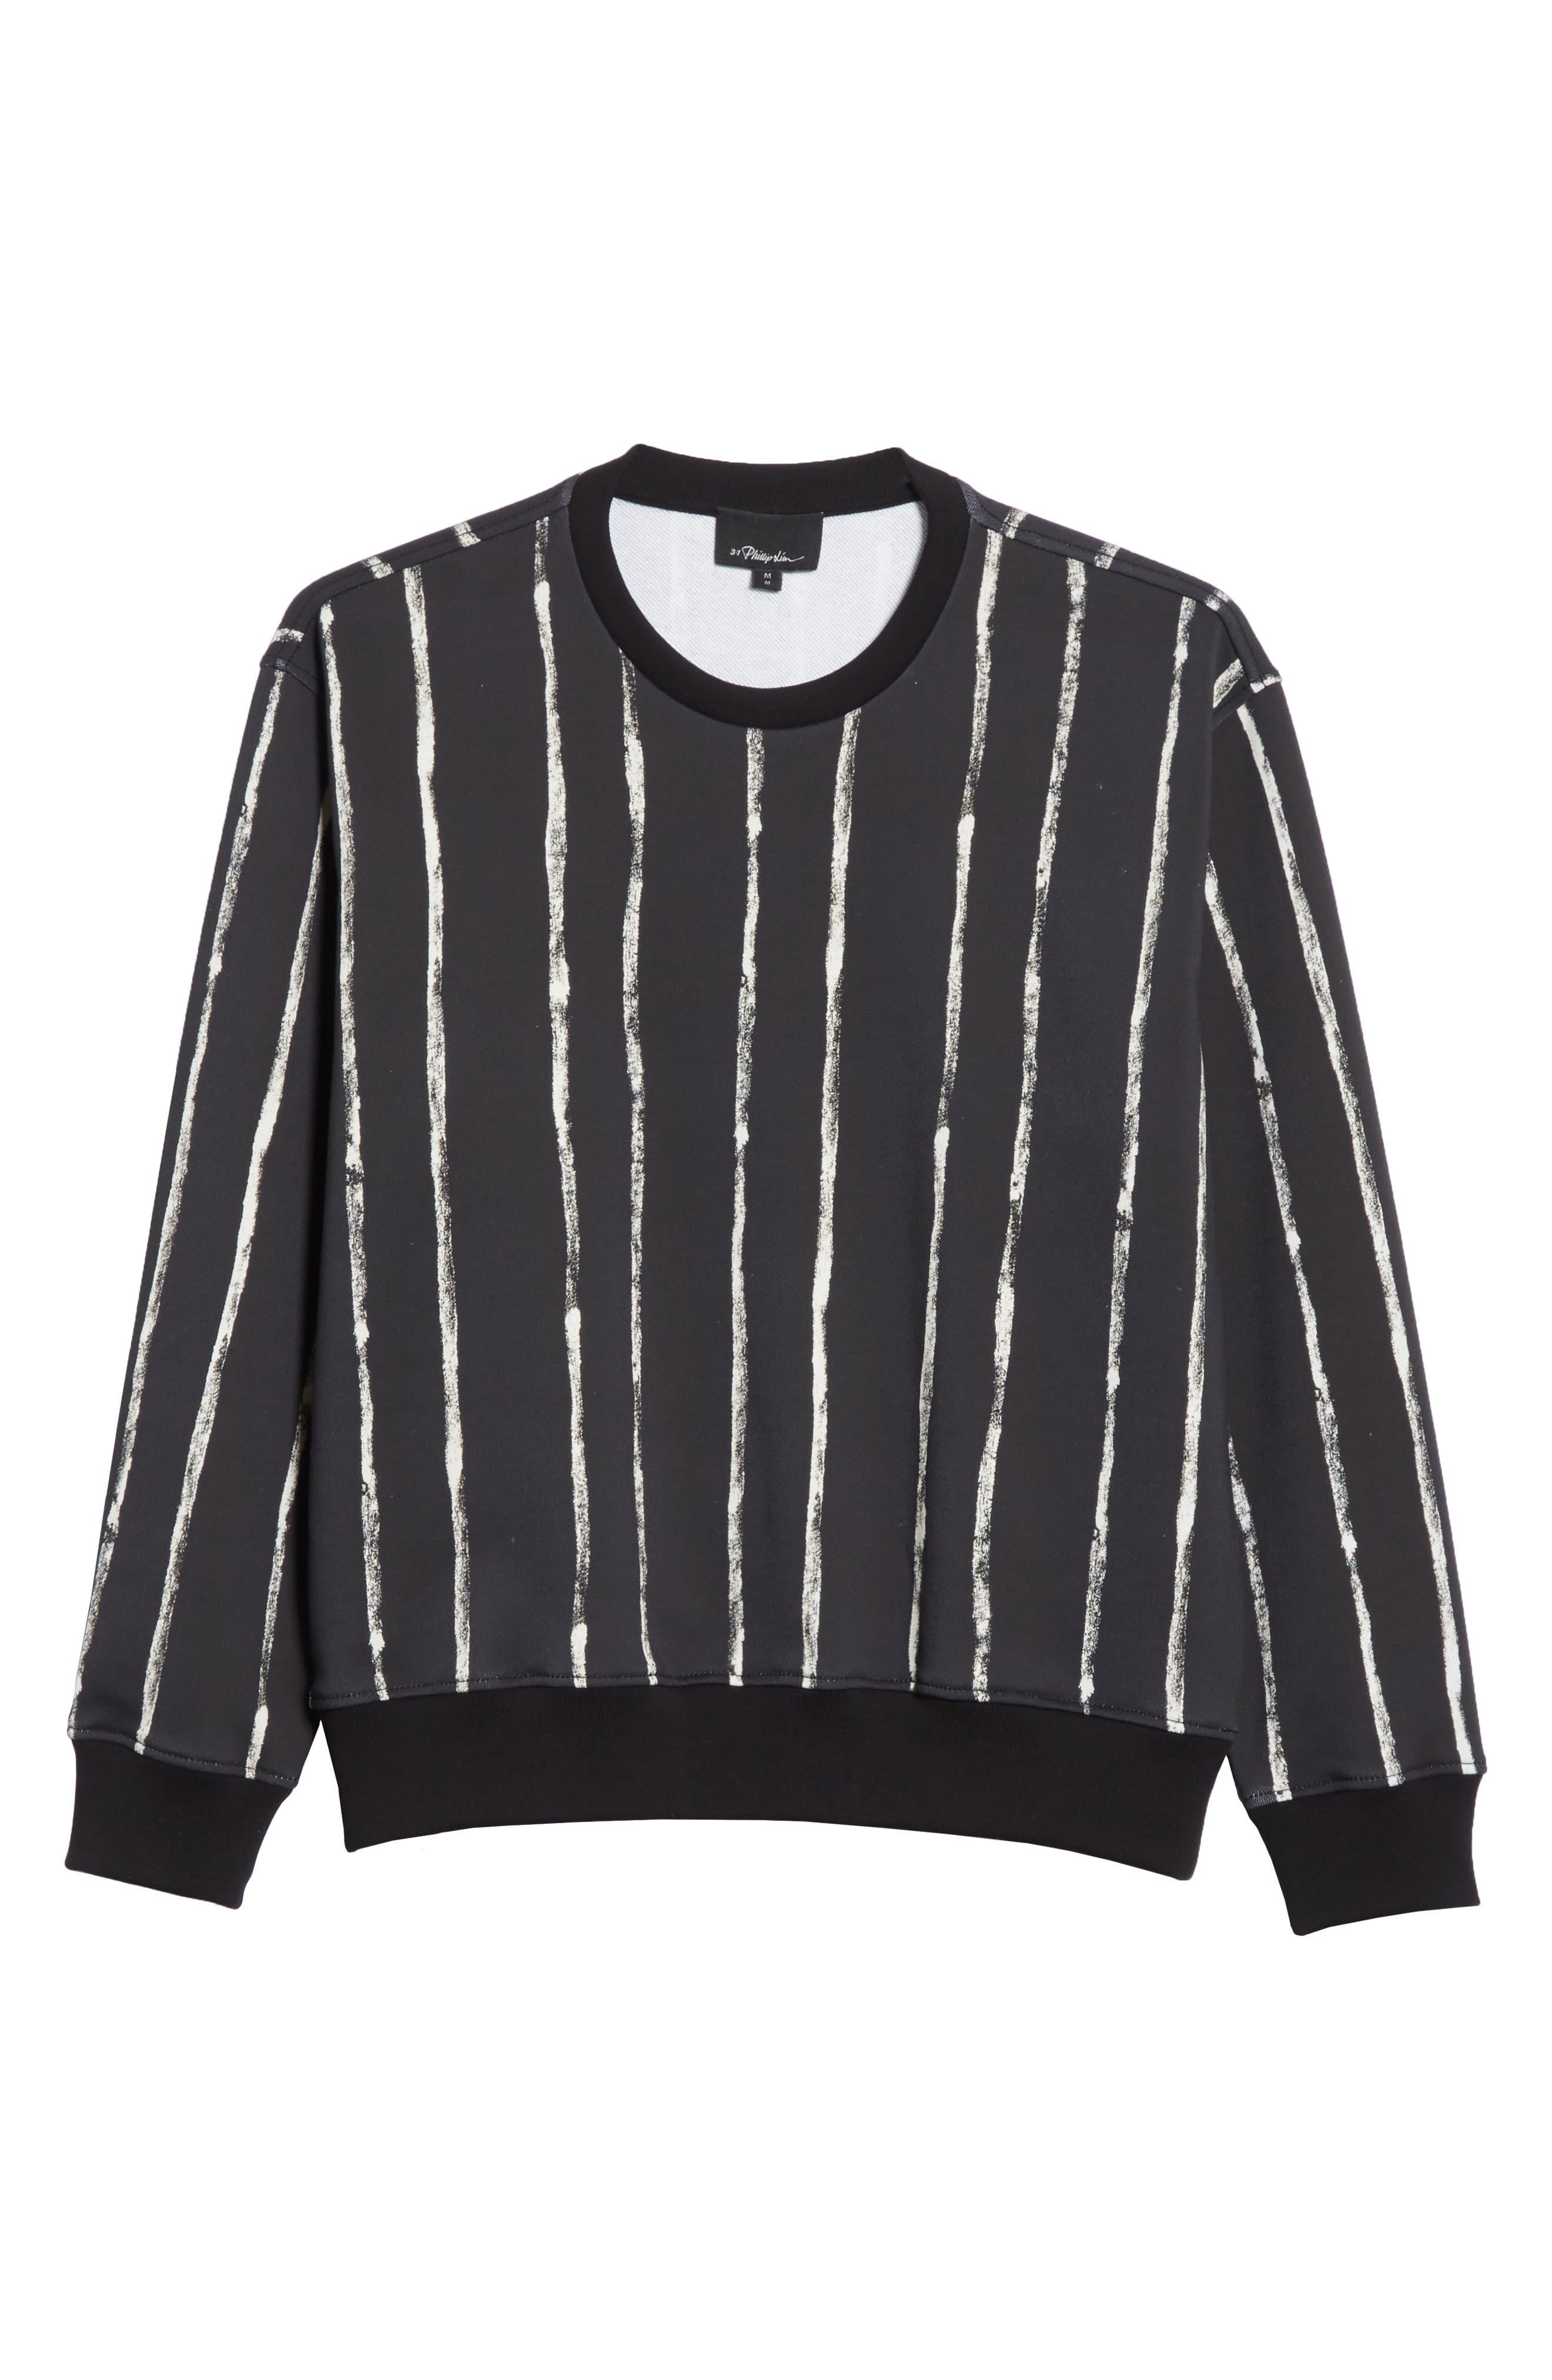 Paint Stripe Crewneck Sweatshirt,                             Alternate thumbnail 6, color,                             Black/ White